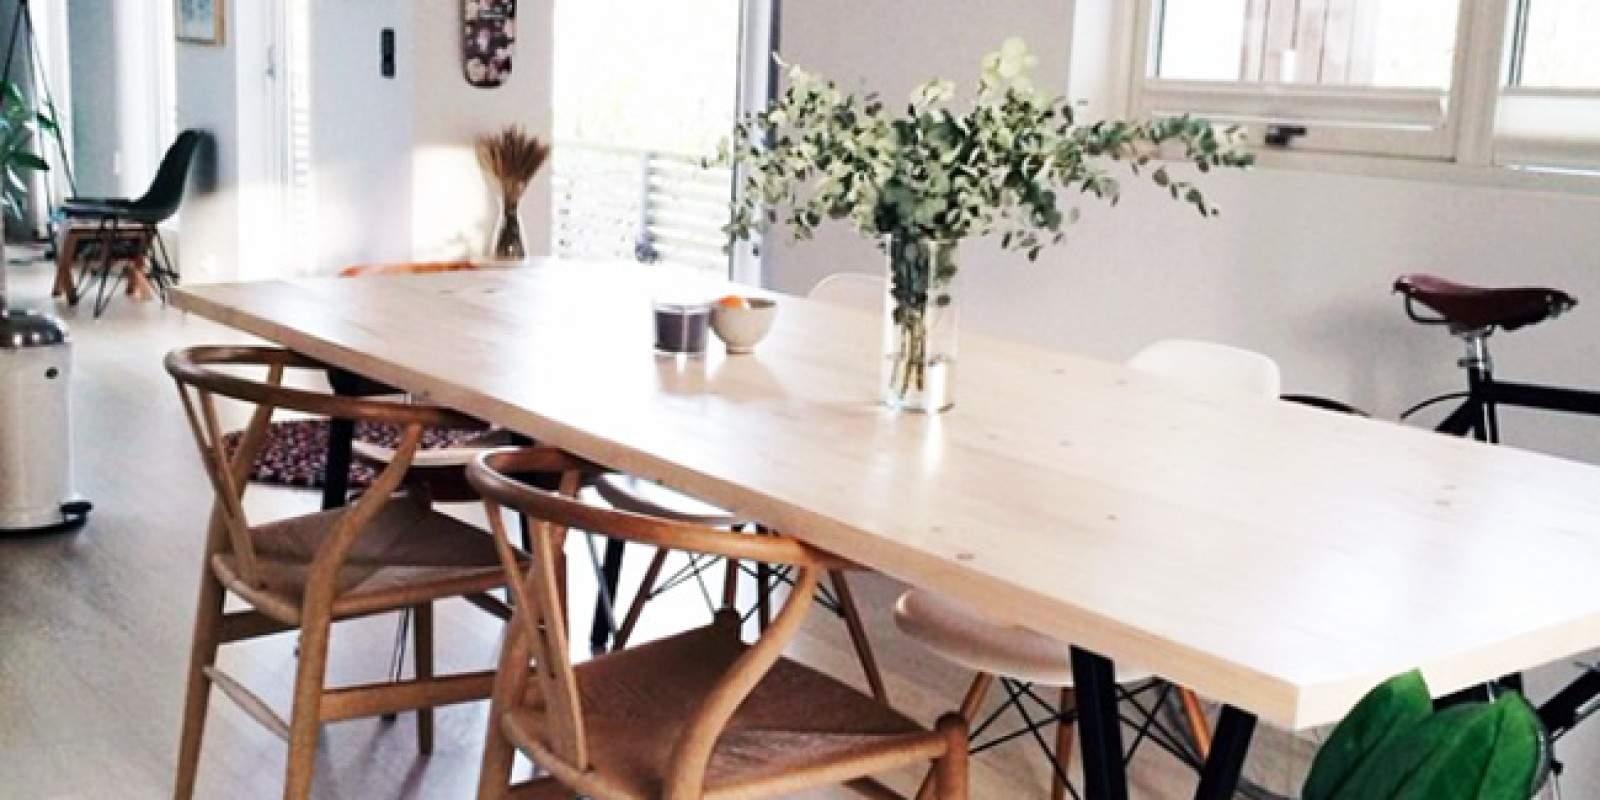 Appartement scandinave fredrikrisvik deco design for Appartement design deco